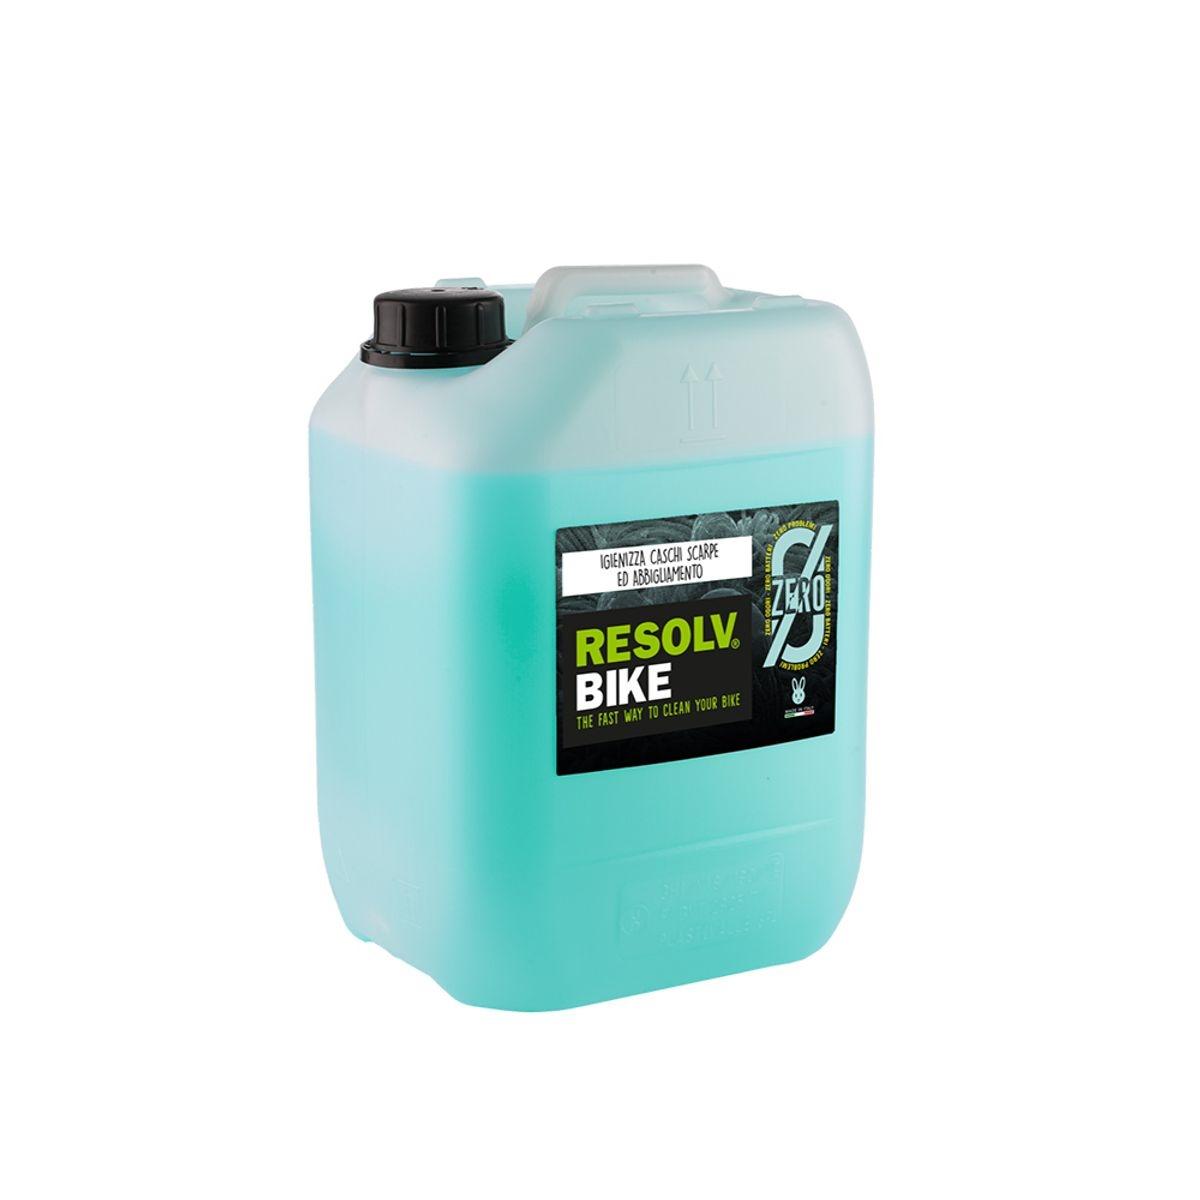 Spray Zero 100% Natural Sanitising Solution 5L